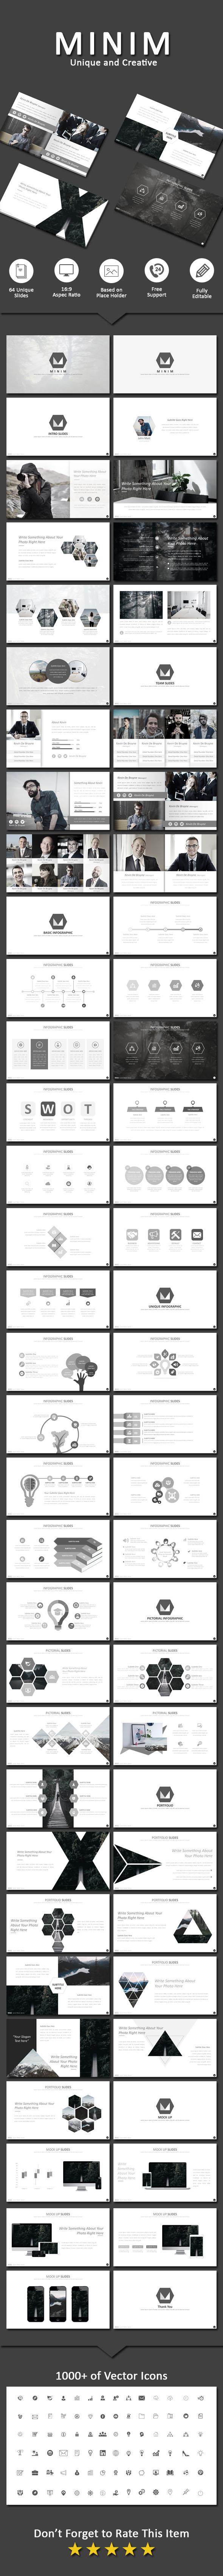 Minim - Business PowerPoint Templates